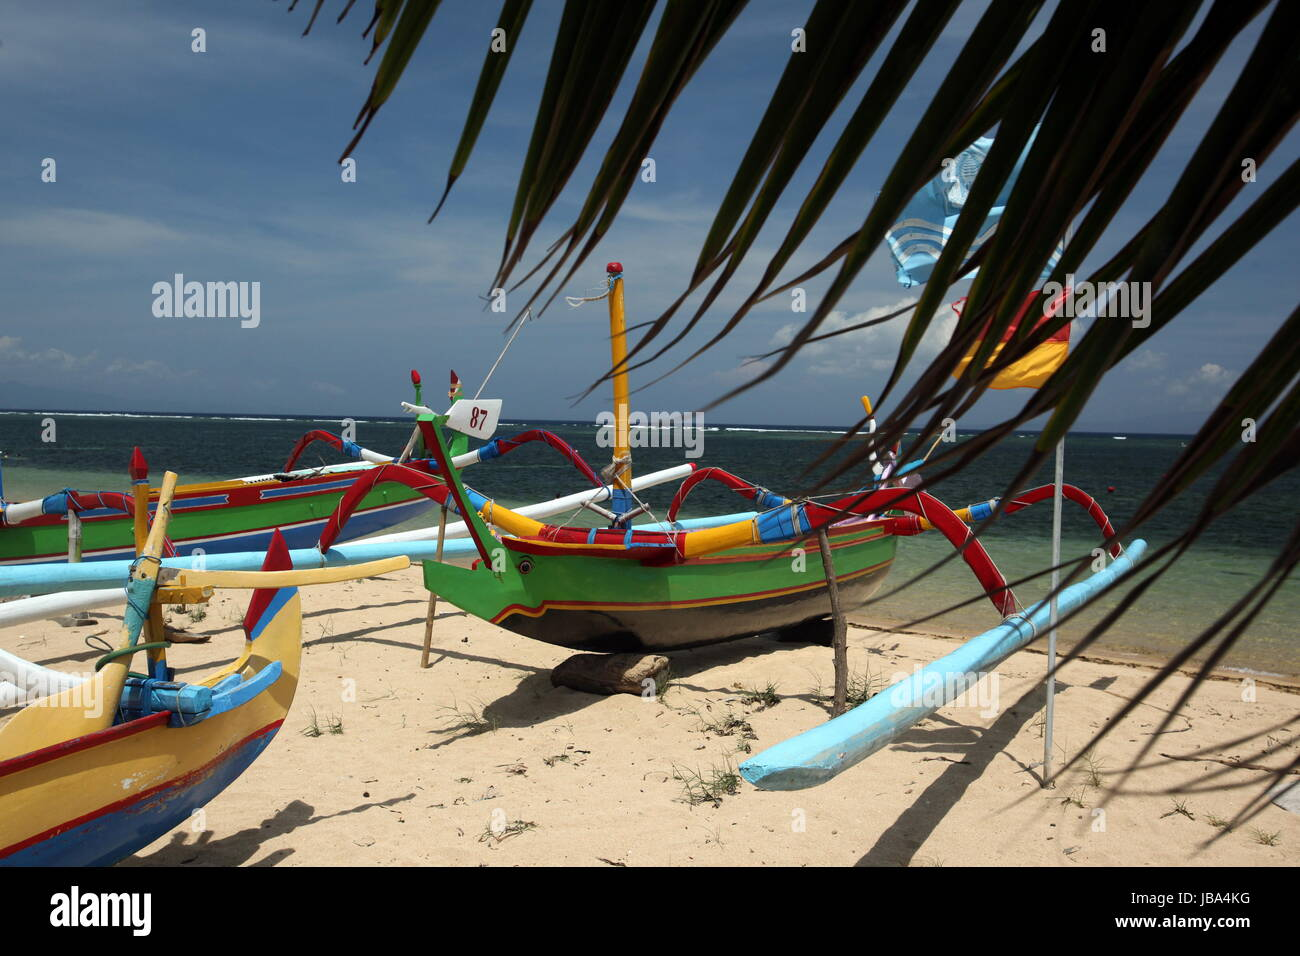 Asien, Suedost, Indonesien, Bali, Insel, Sanur, Strand, Fischerboot,  (Urs Flueeler) - Stock Image